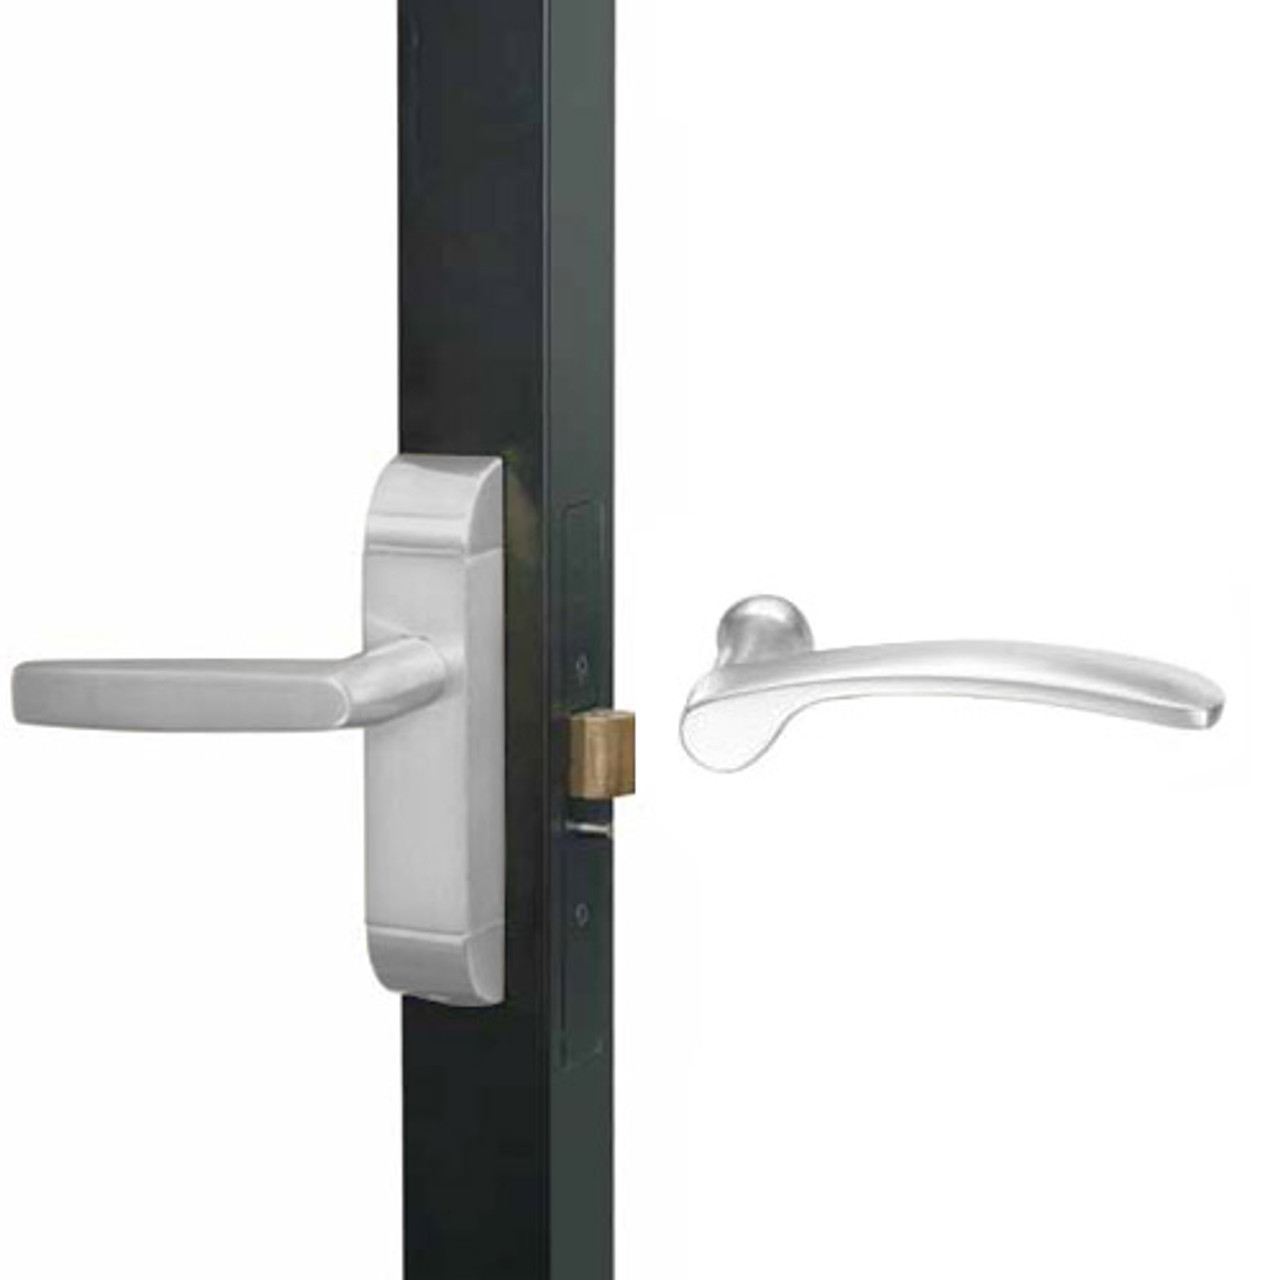 4600M-MN-611-US32 Adams Rite MN Designer Deadlatch handle in Bright Stainless Finish